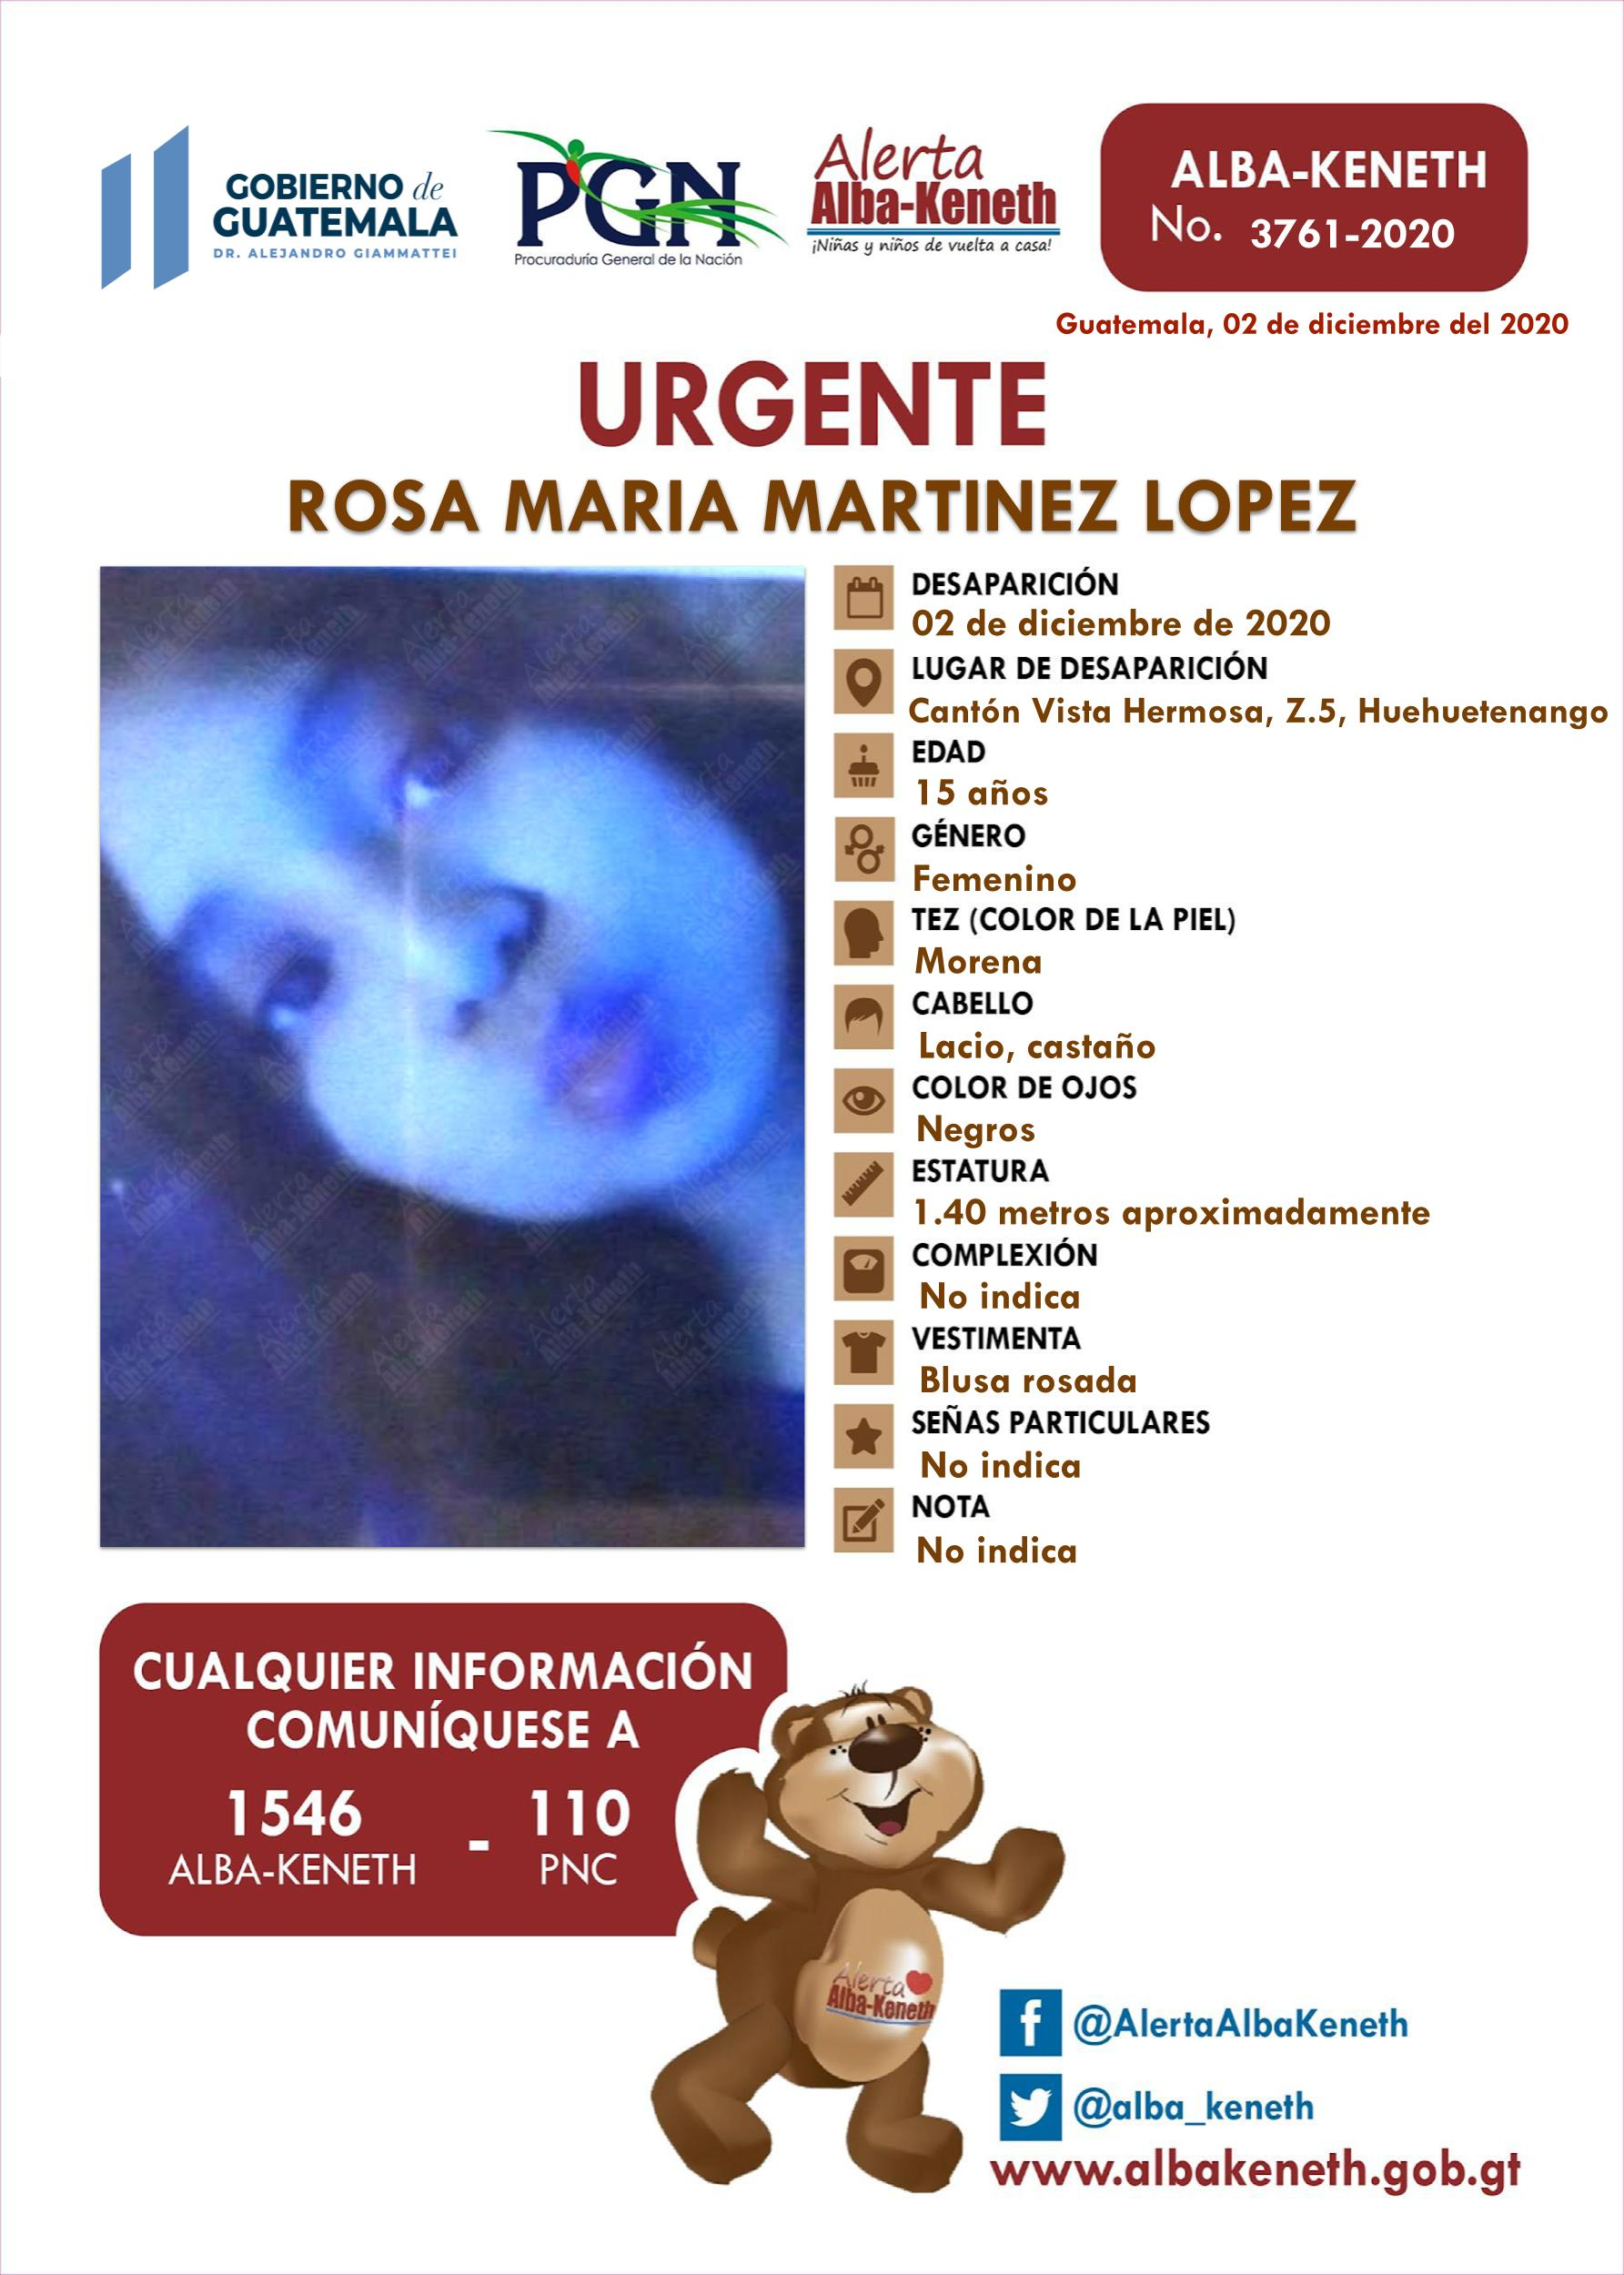 Rosa Maria Martinez Lopez